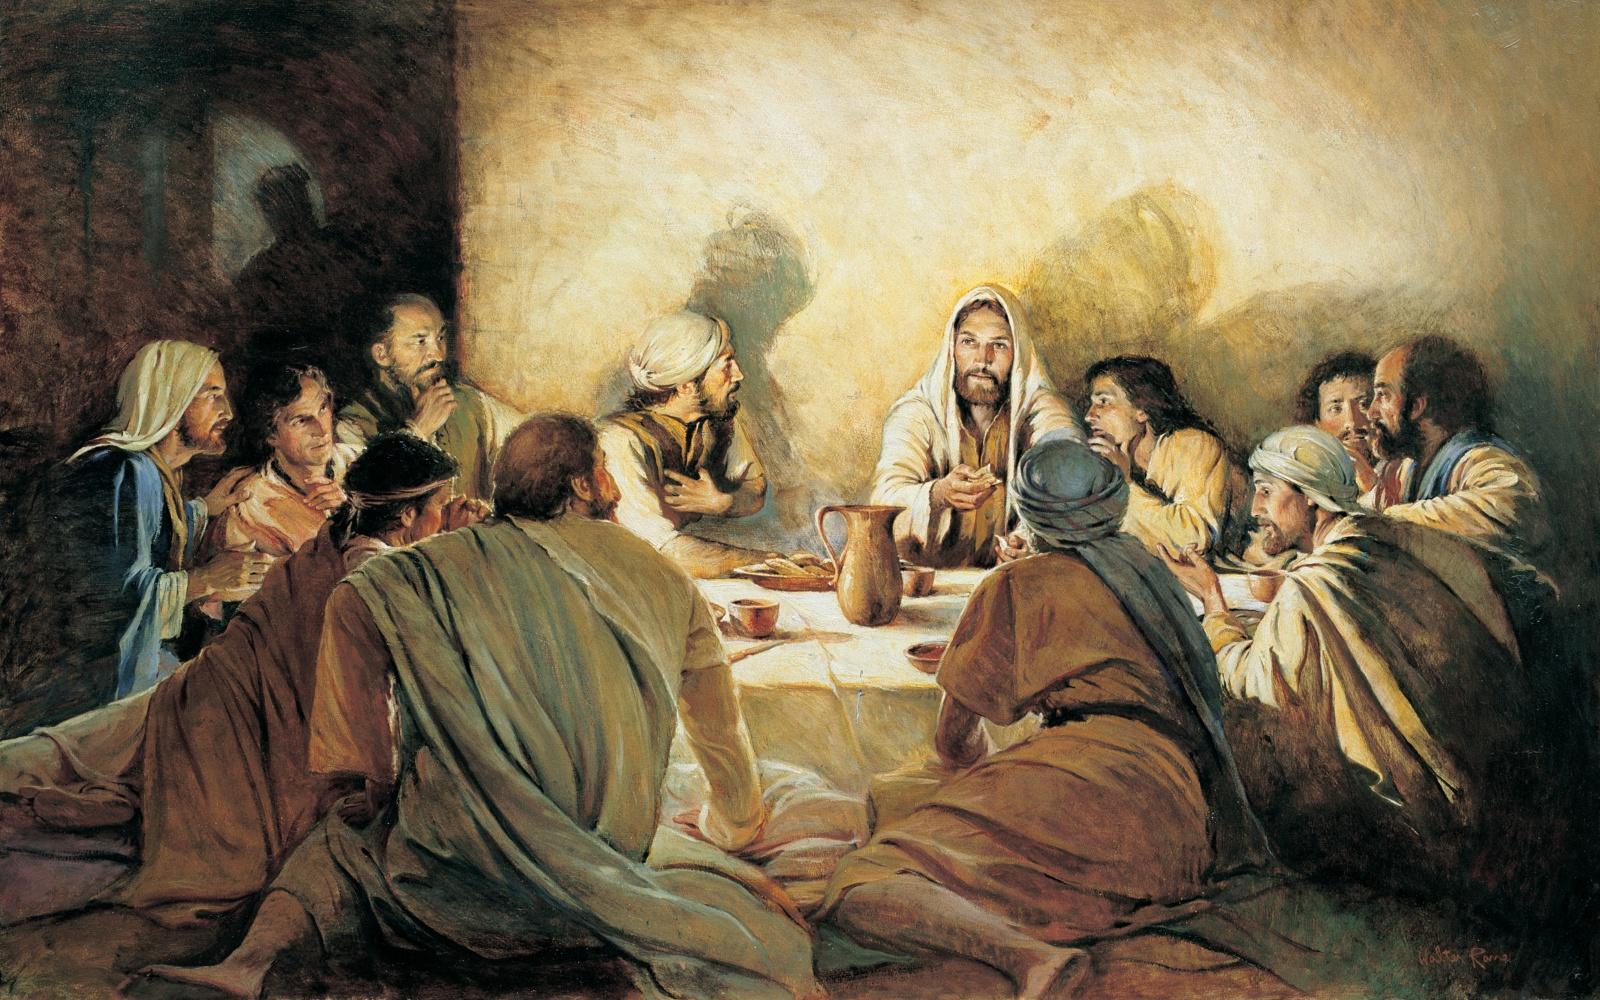 Jesus Sidste nadver / Last supper